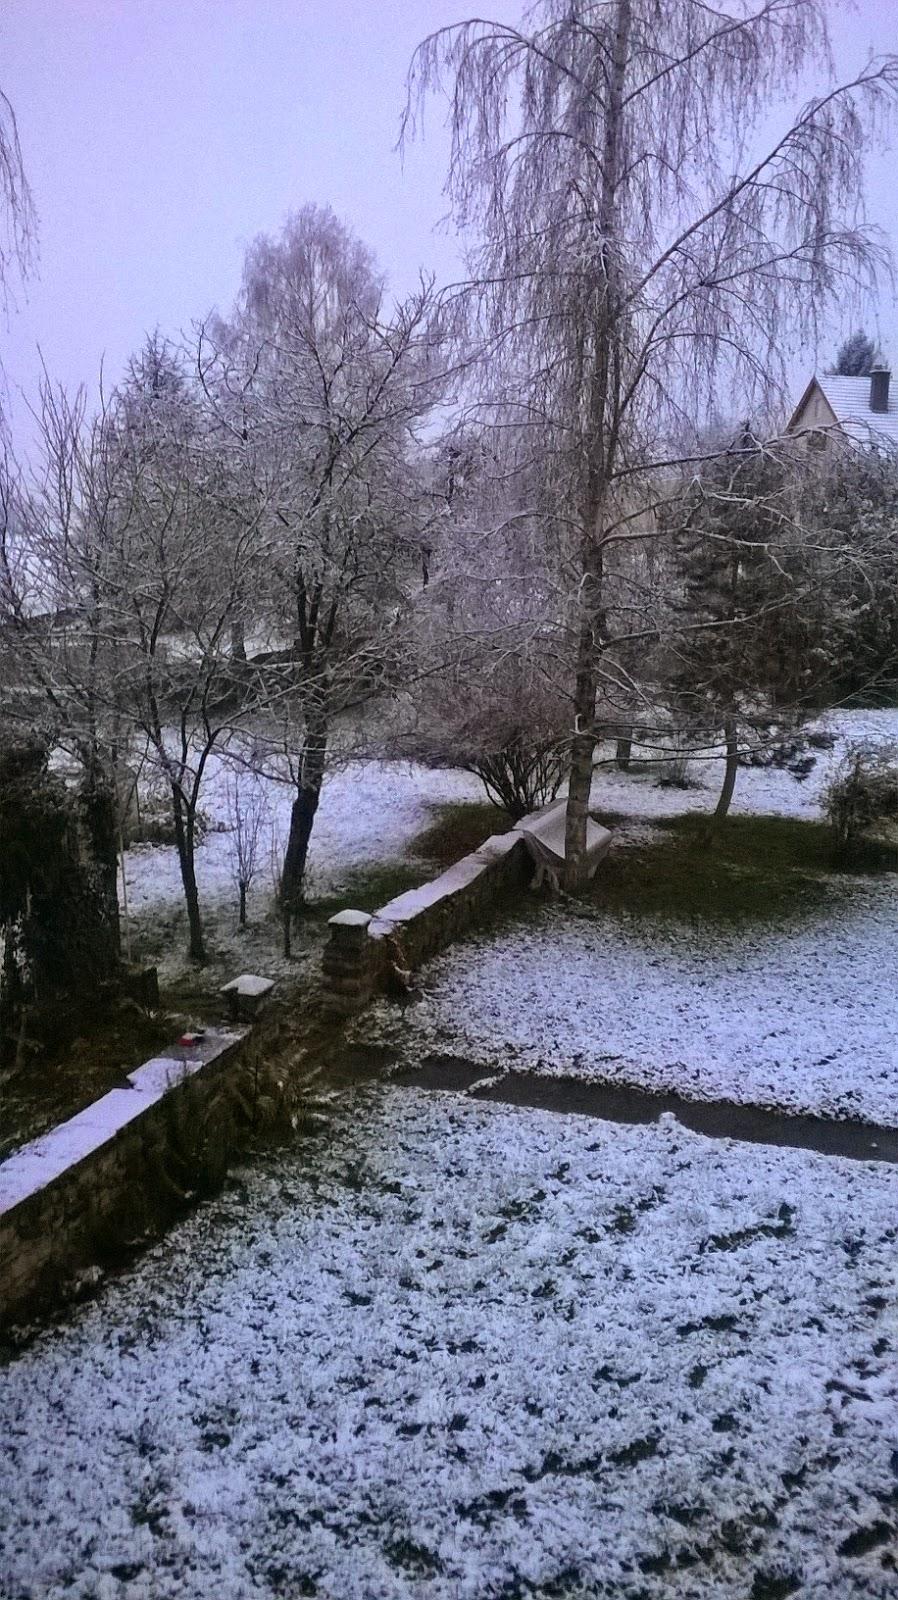 http://www.petitesastucesentrefilles.com/2014/12/la-neige.html